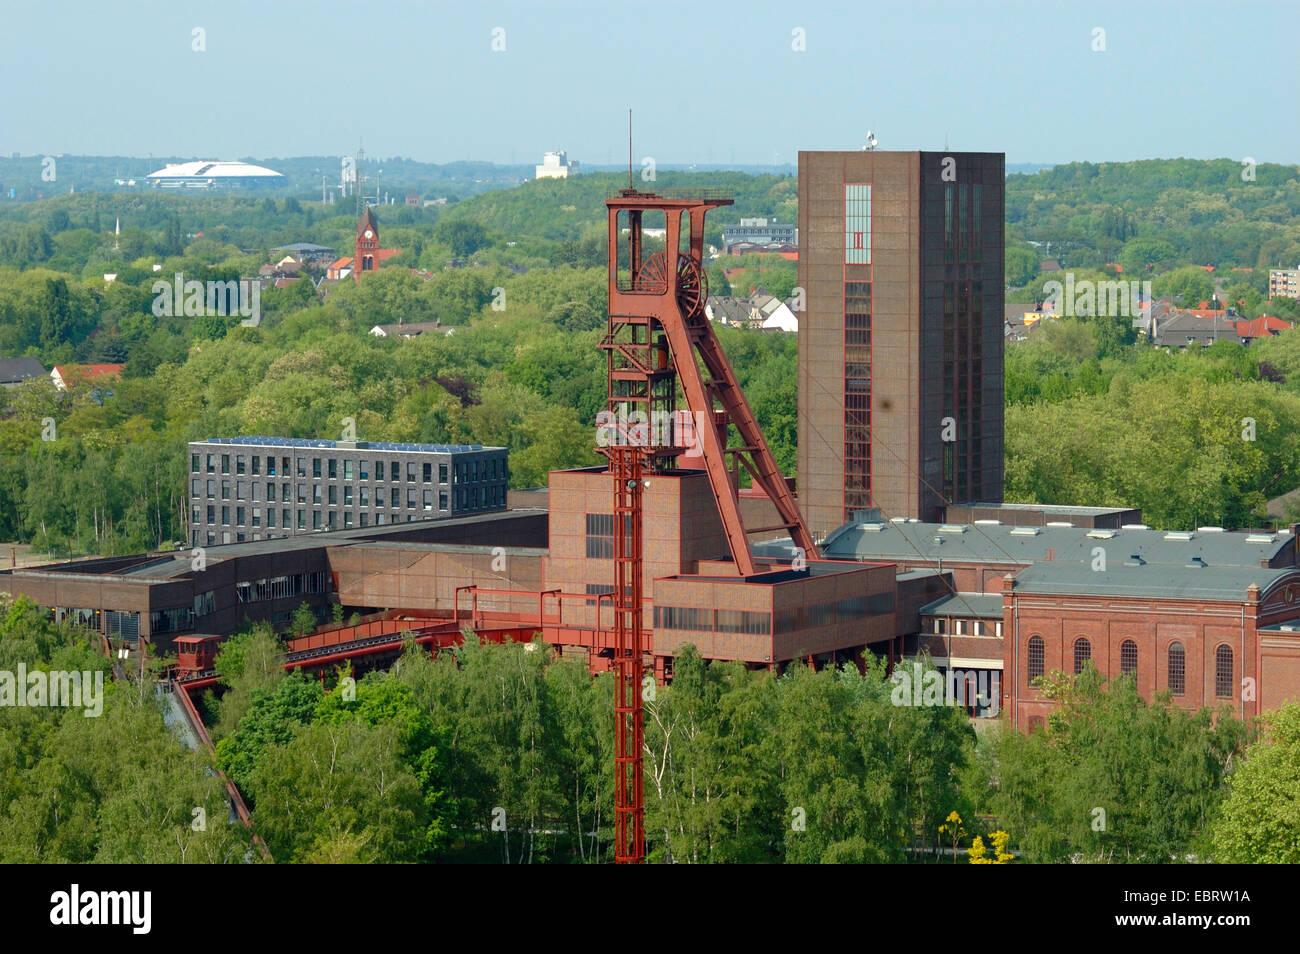 outlook from Zollverein Coal Mine Industrial Complex, Germany, North Rhine-Westphalia, Ruhr Area, Essen - Stock Image